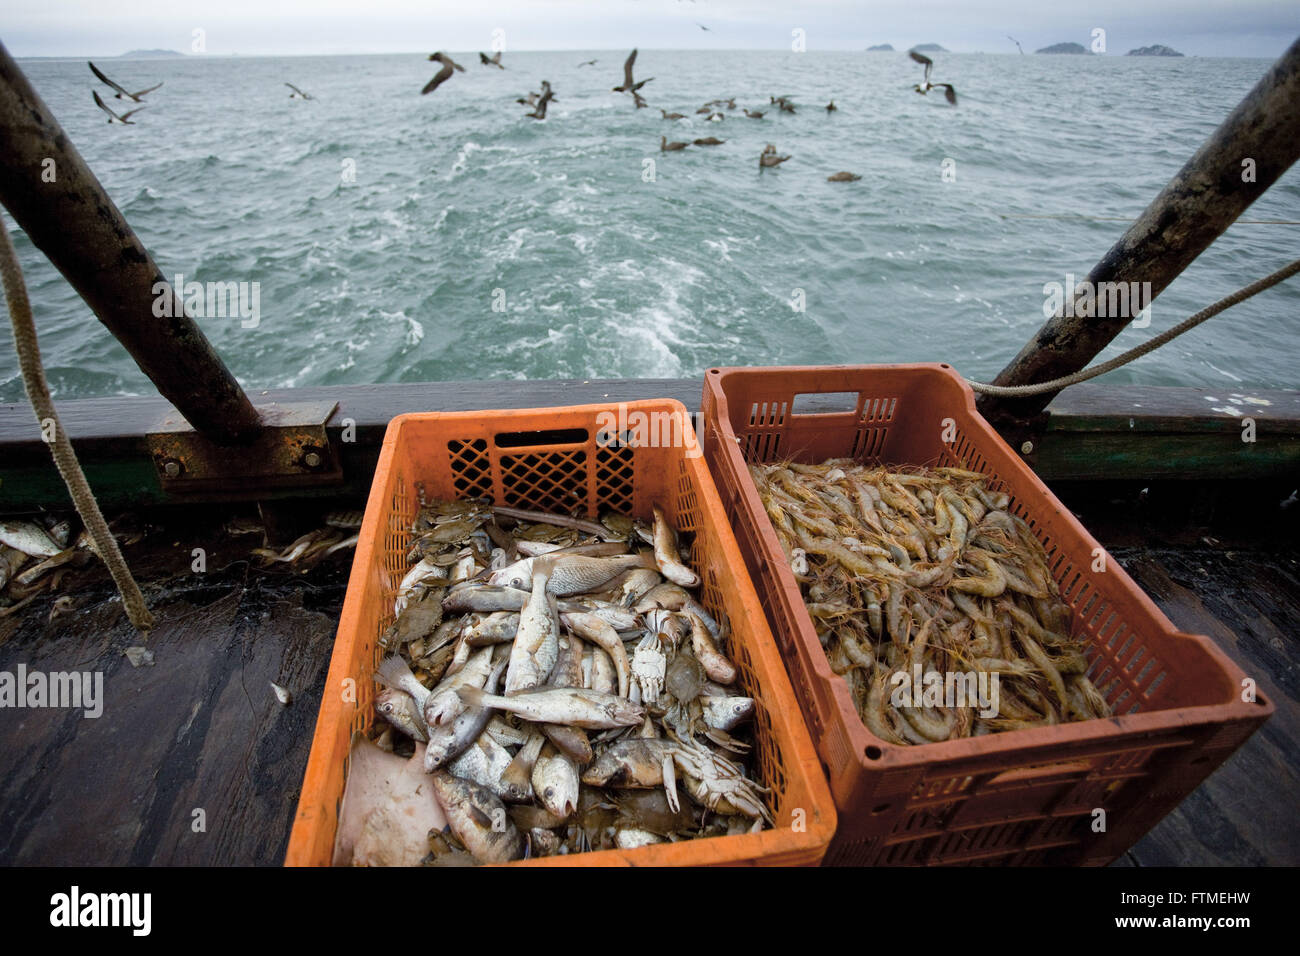 Shrimp and selected seafoods - shrimp trawling the coast of Santa Catarina - Stock Image